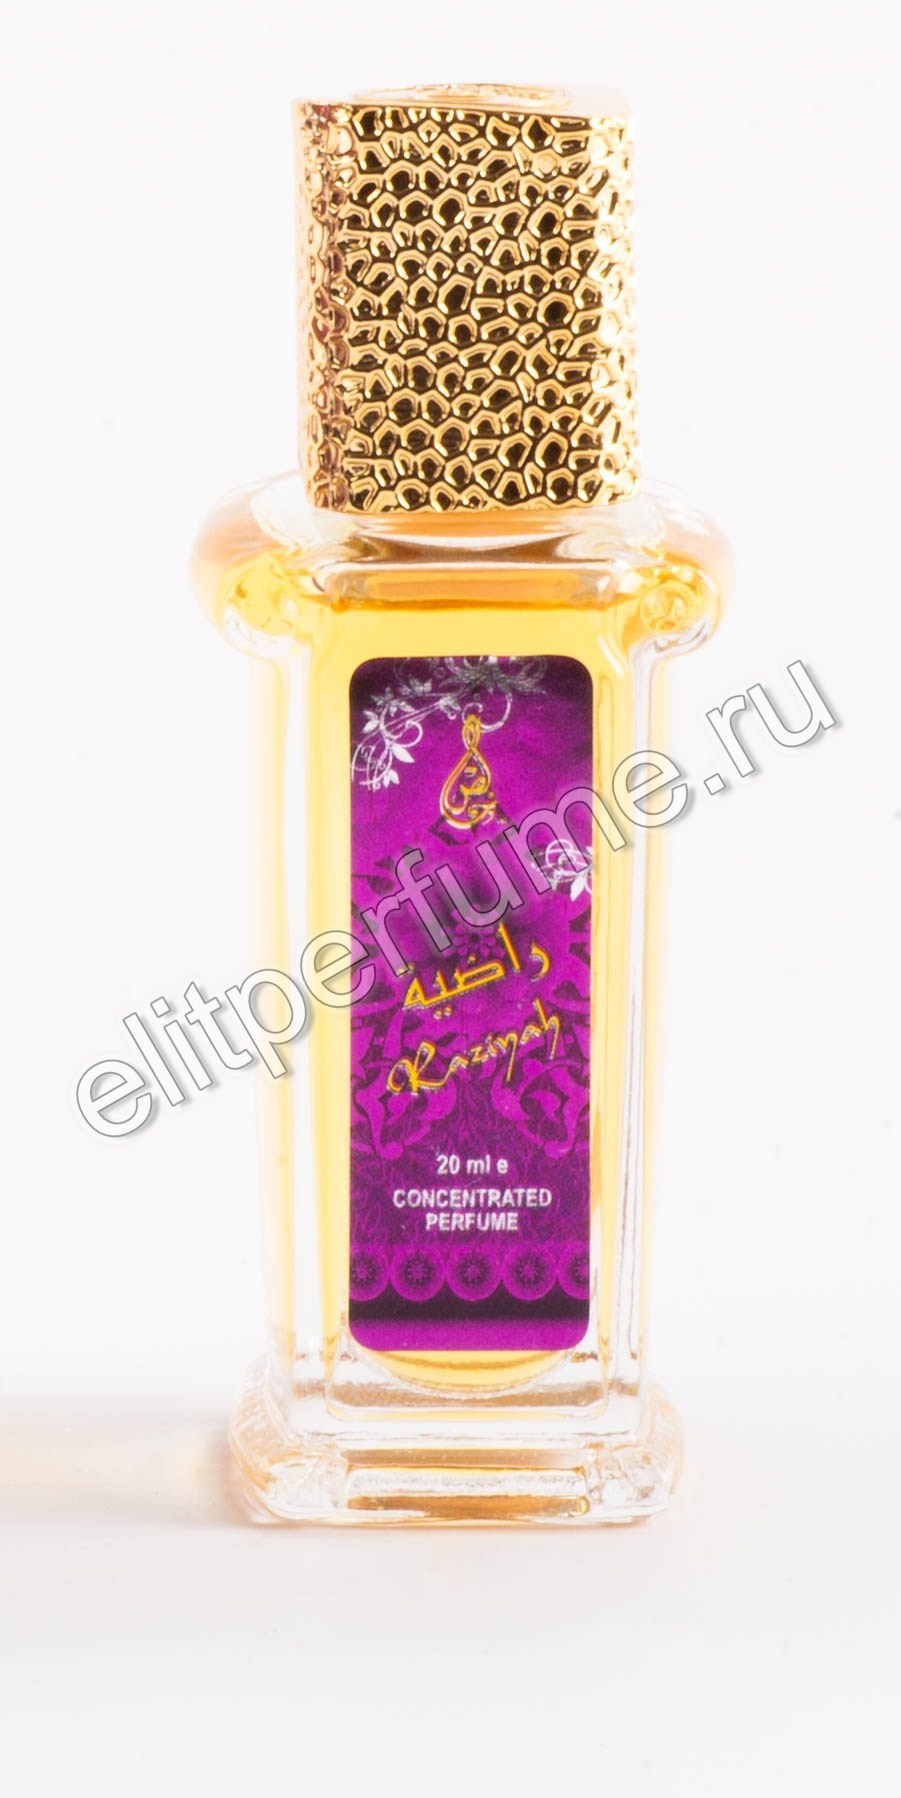 Razinah Разинах 20 мл арабские масляные духи от Халис Khalis Perfumes